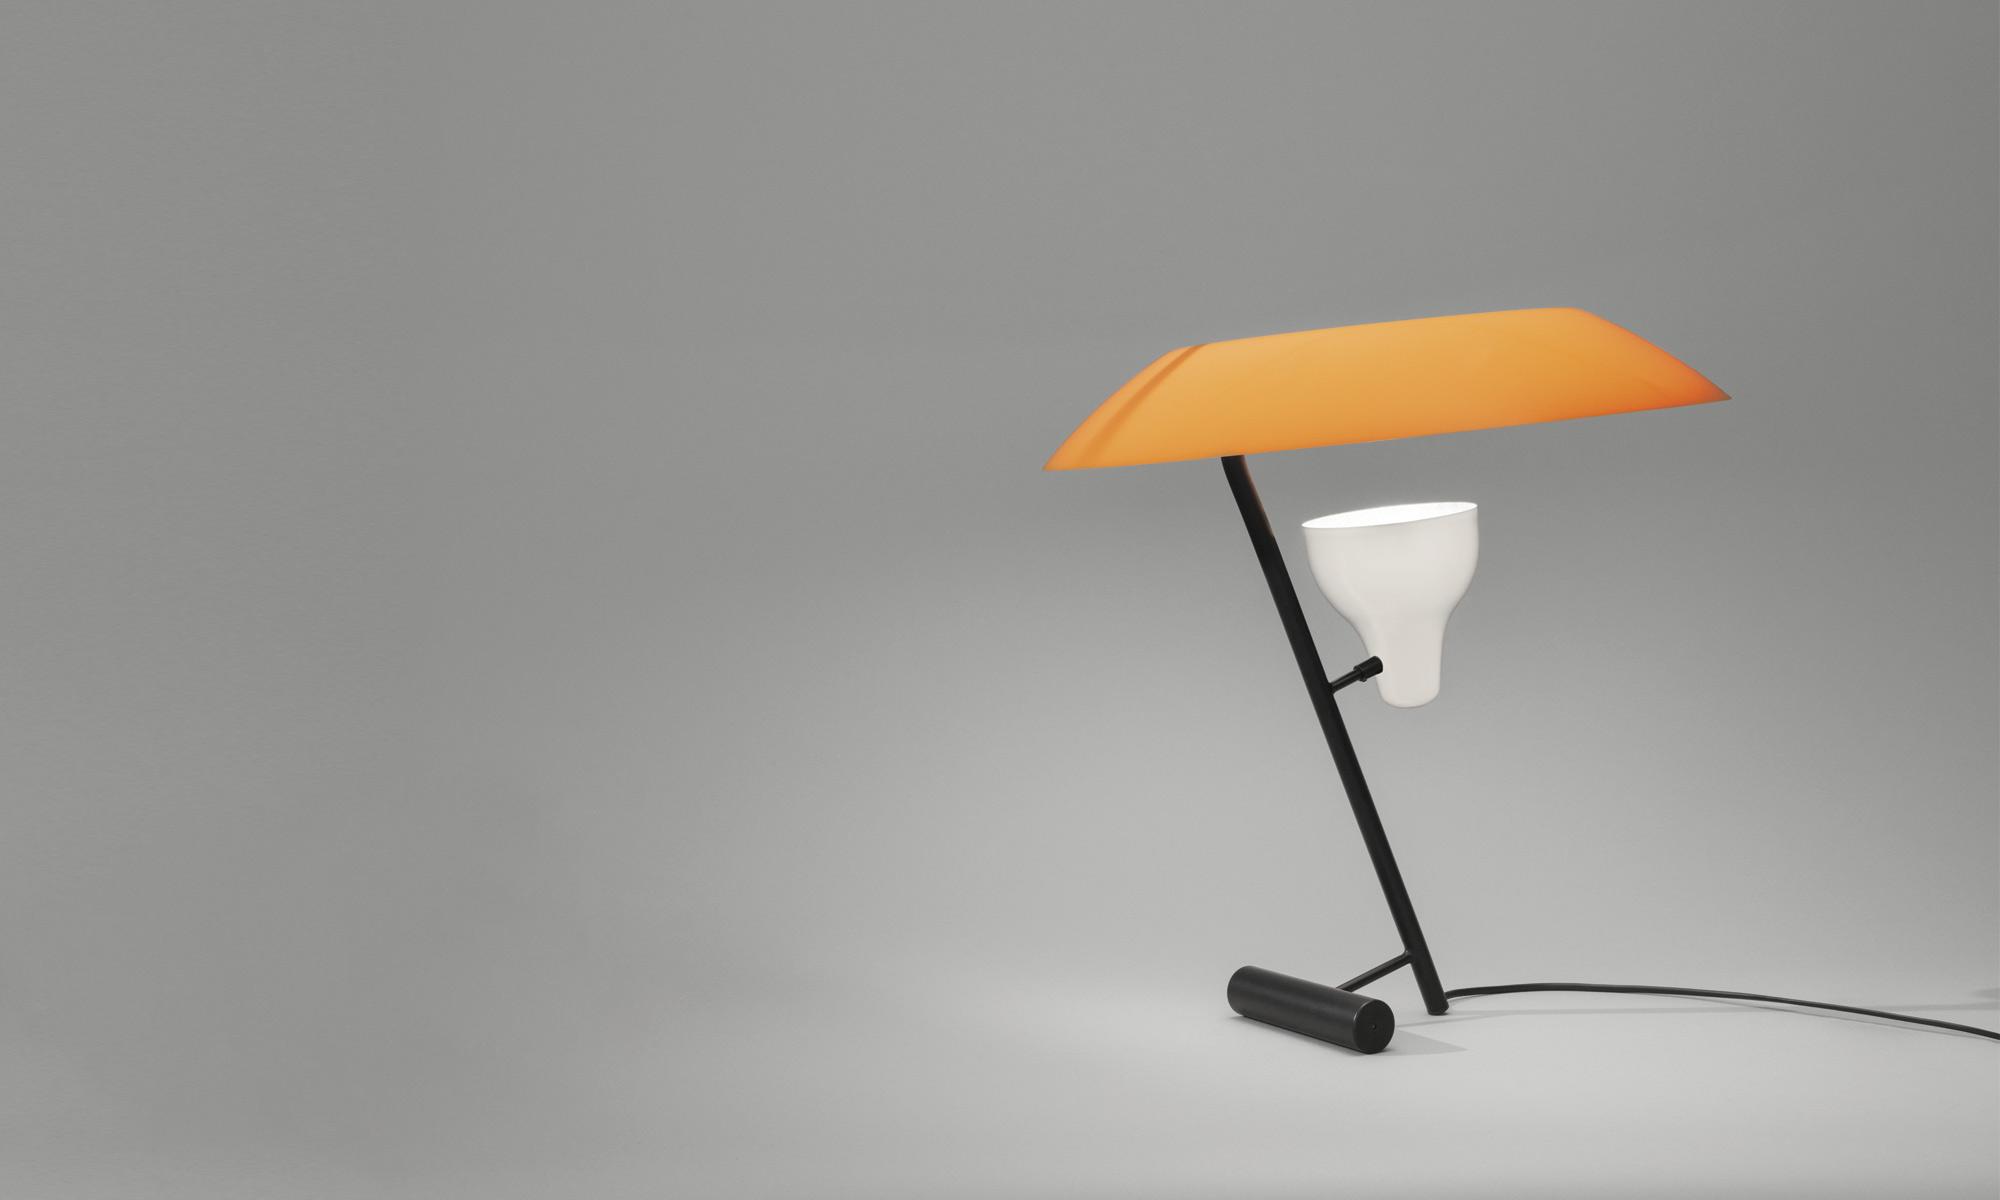 Tafellamp Model 548 Design Gino Sarfatti Voor Astep